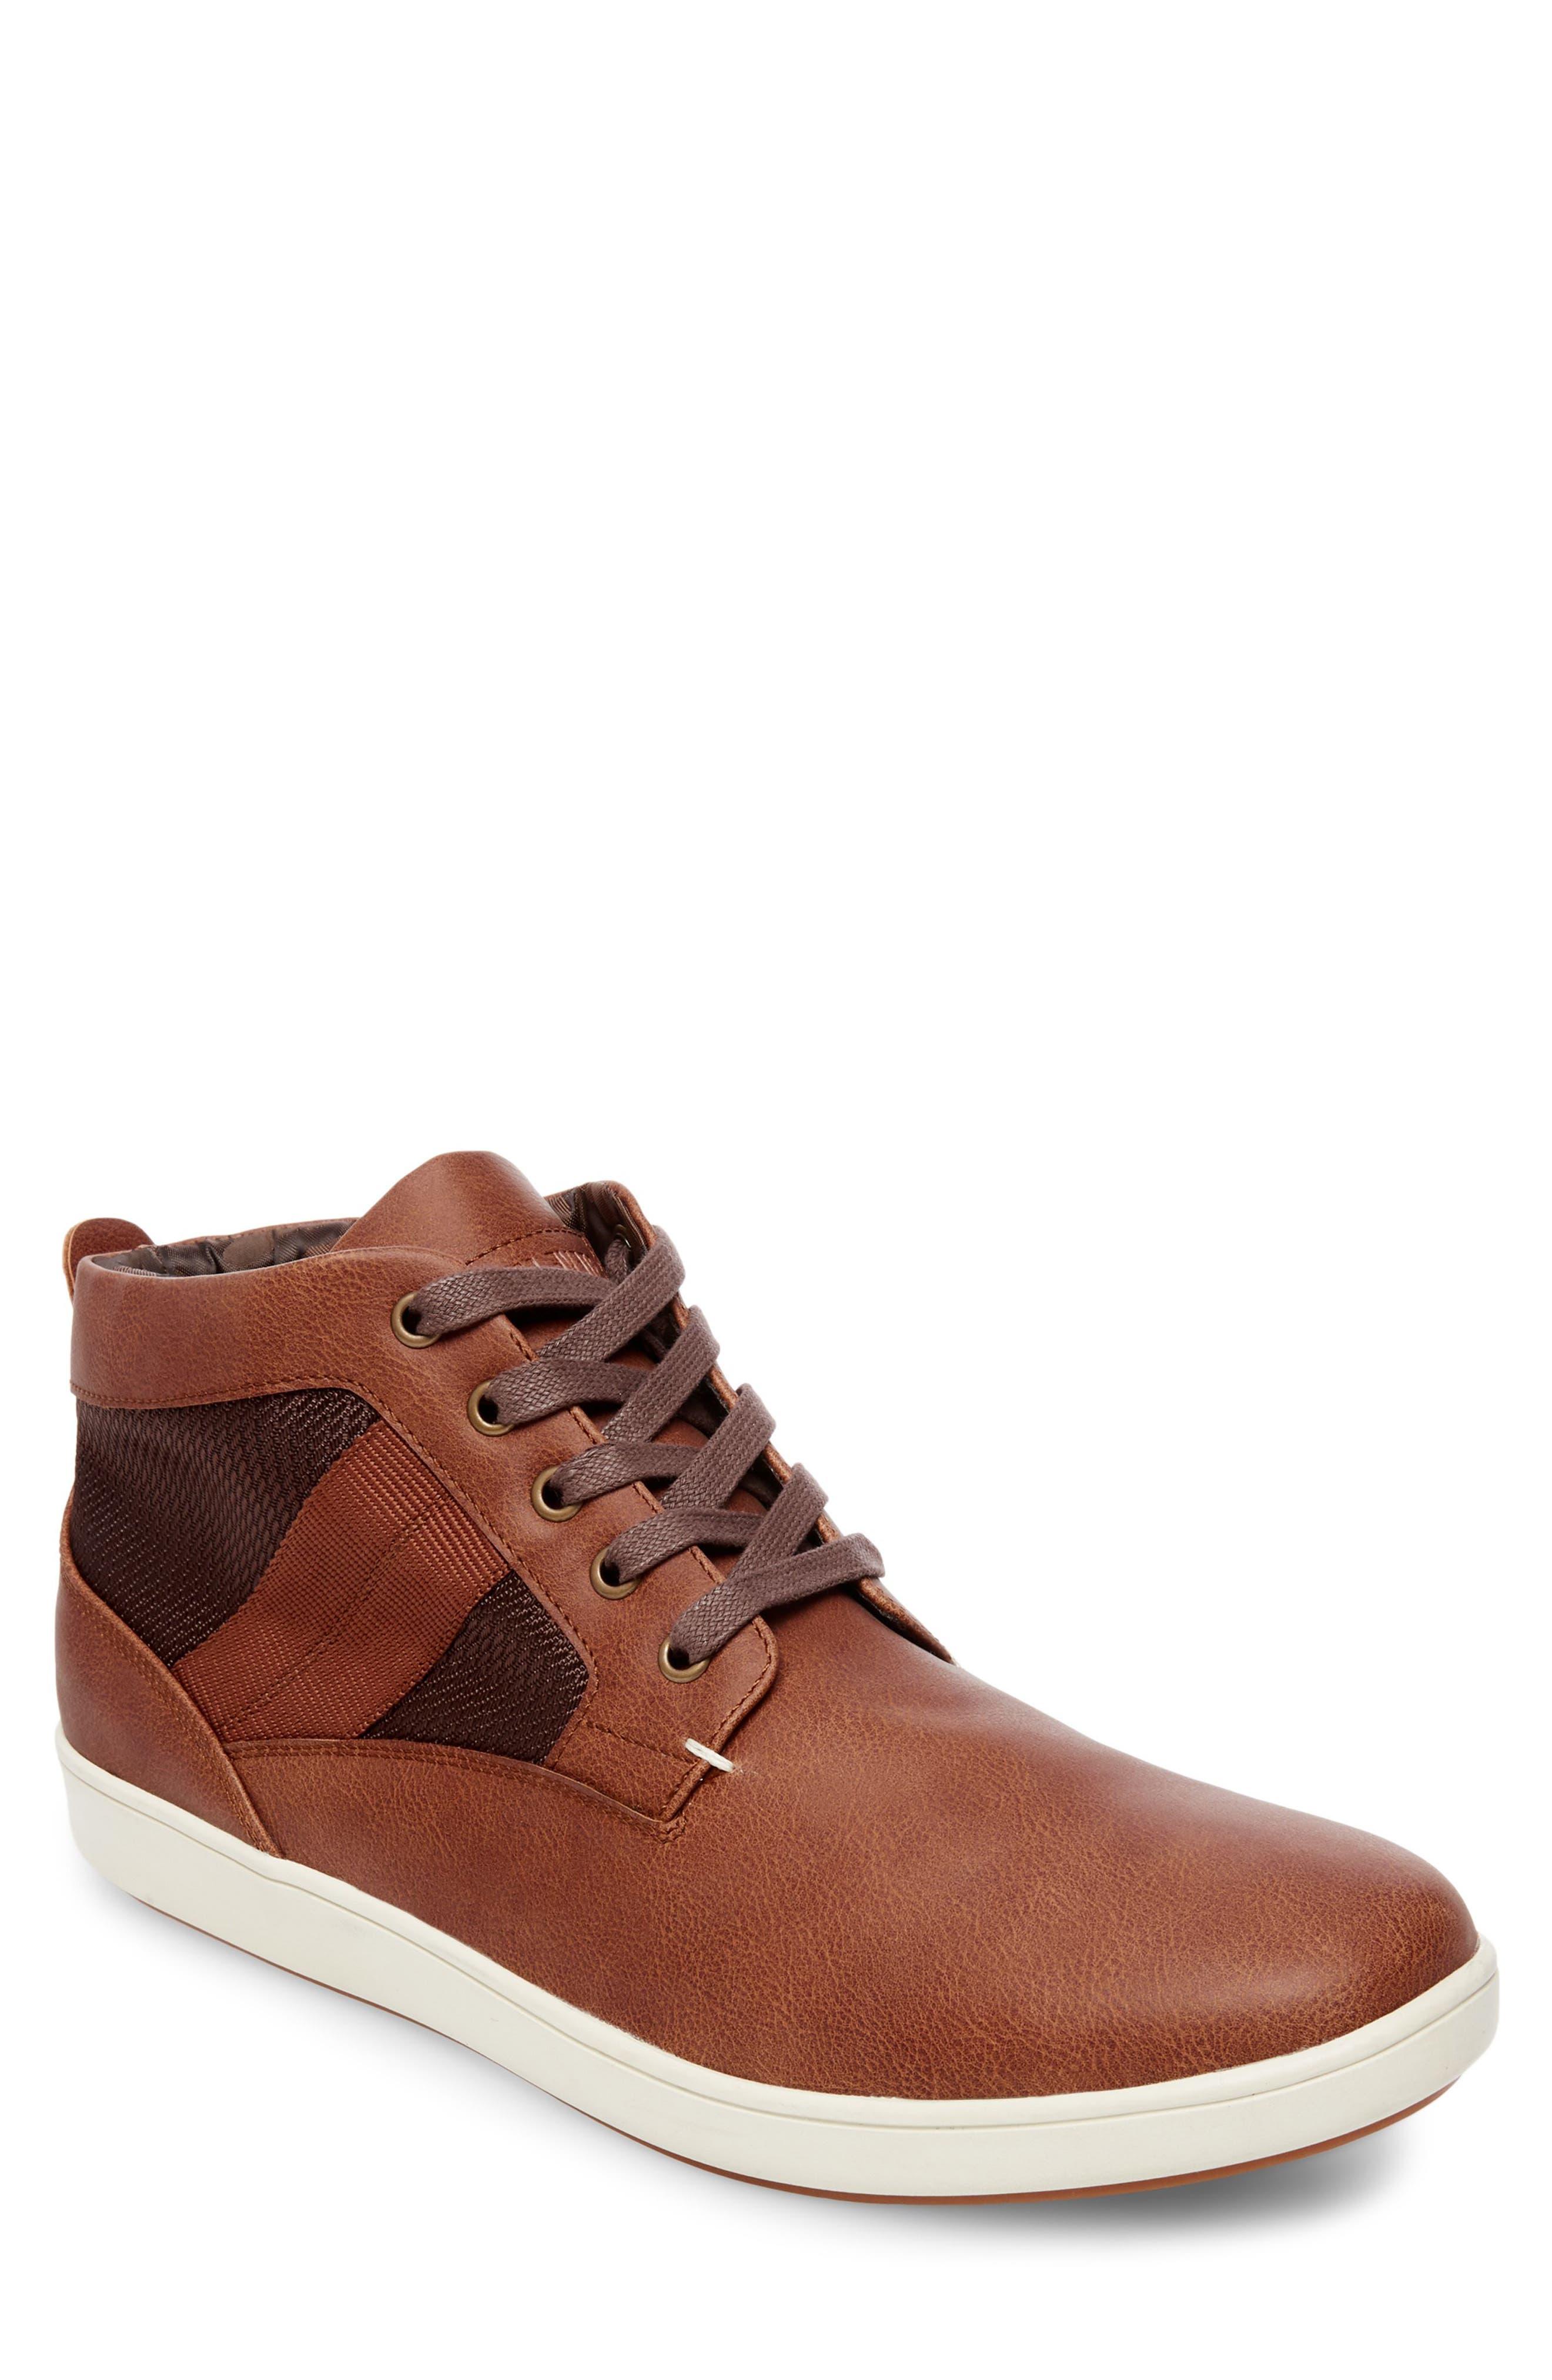 Frazier Sneaker Boot,                         Main,                         color, Cognac